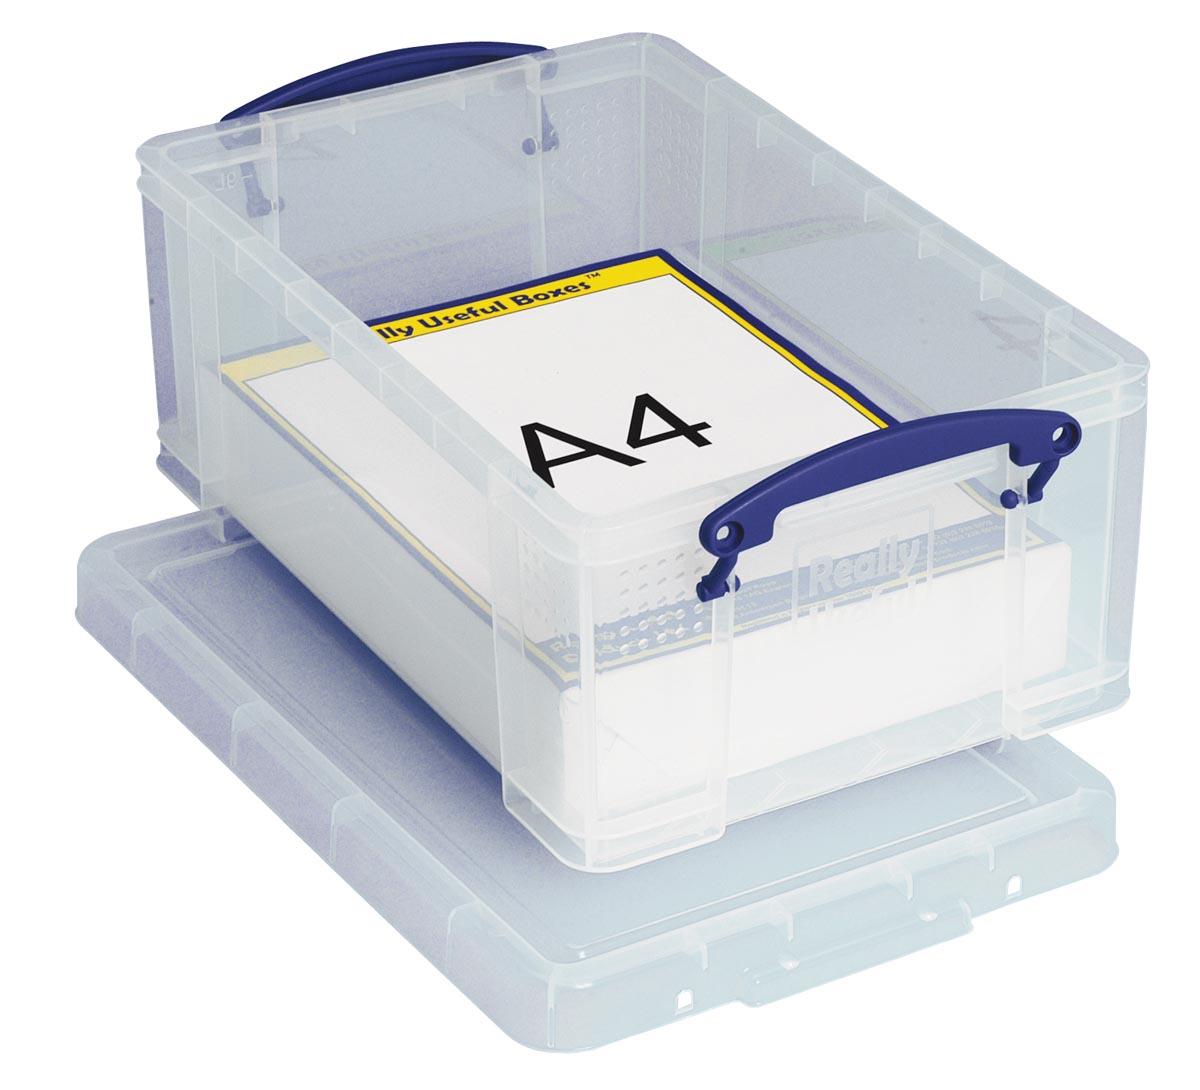 Really Useful Boxes Archiefboxen A4 Transparant Plastic met deksel 25 5 x 39 5 x 15 5 cm Stuks